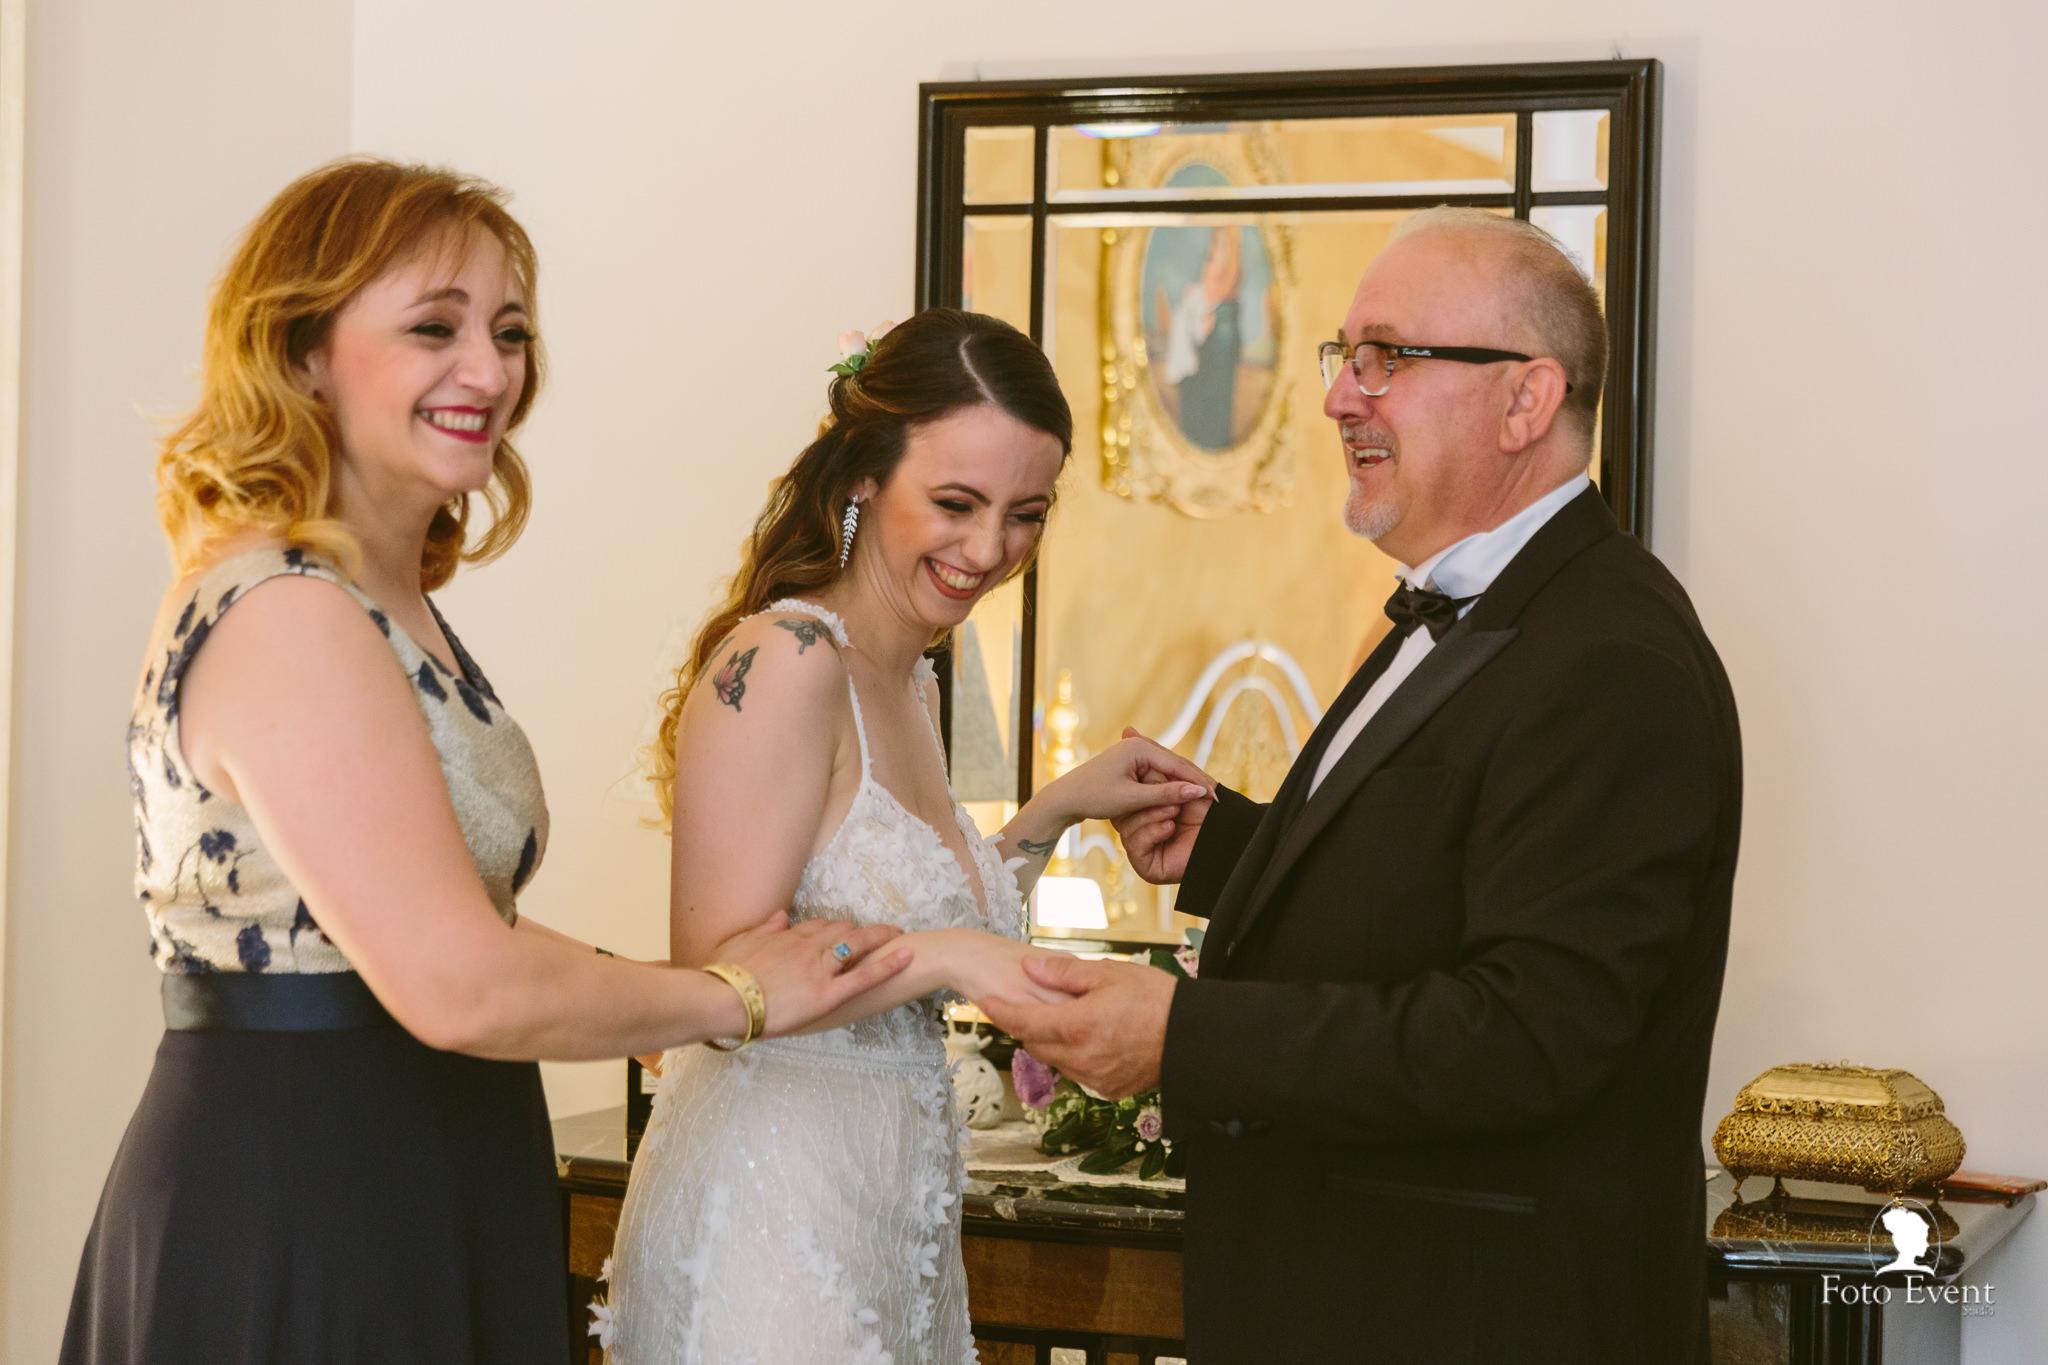 020-2019-08-22-Matrimonio-Angela-e-Nicola-Iaconis-566